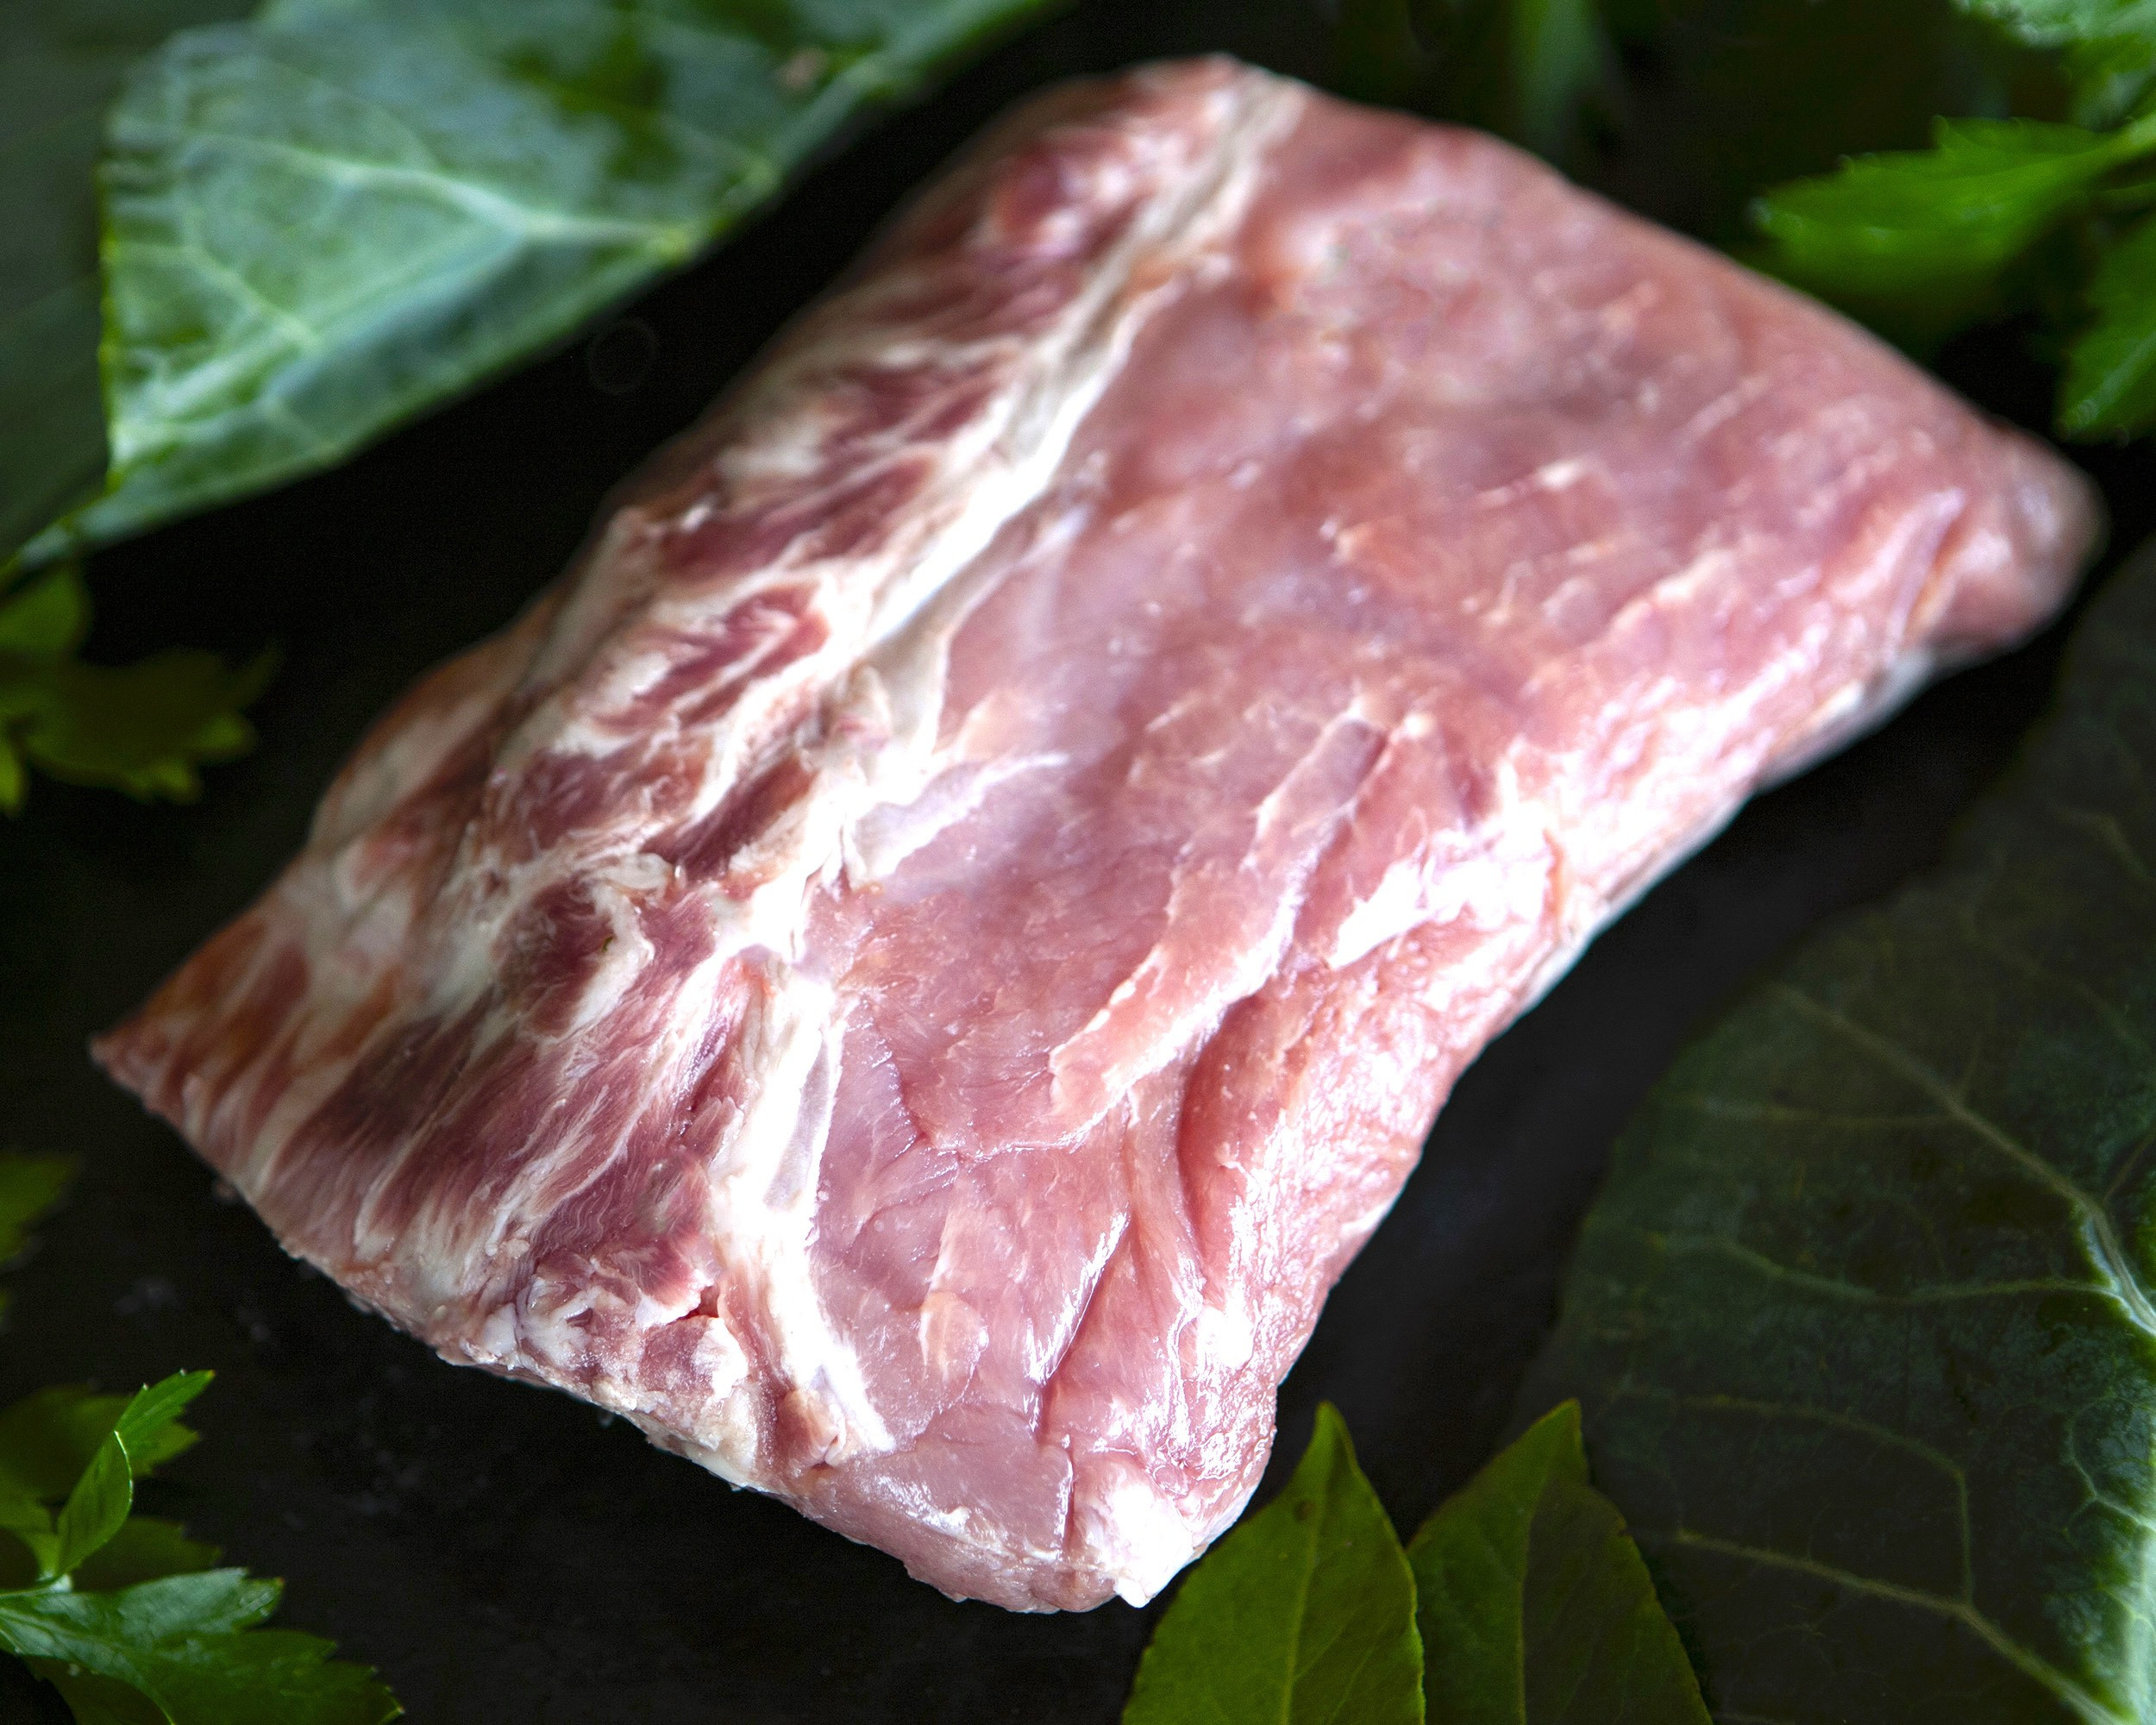 Pork Boneless Loin Roast